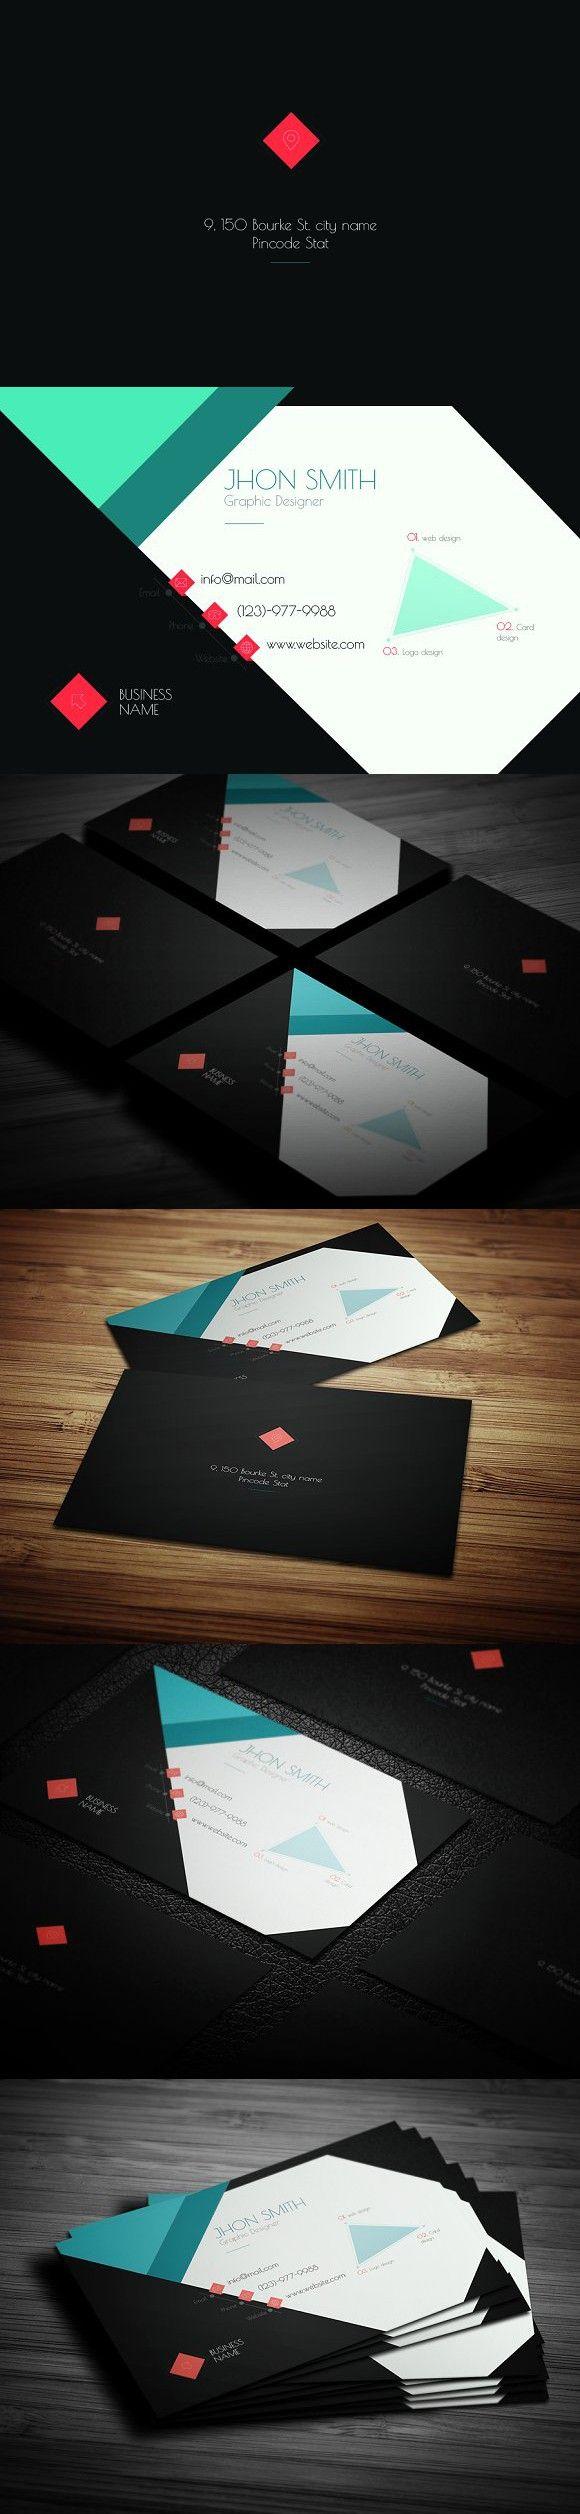 Carte De Visite Name Cards Corporate Business Card Design Templates Lipsense